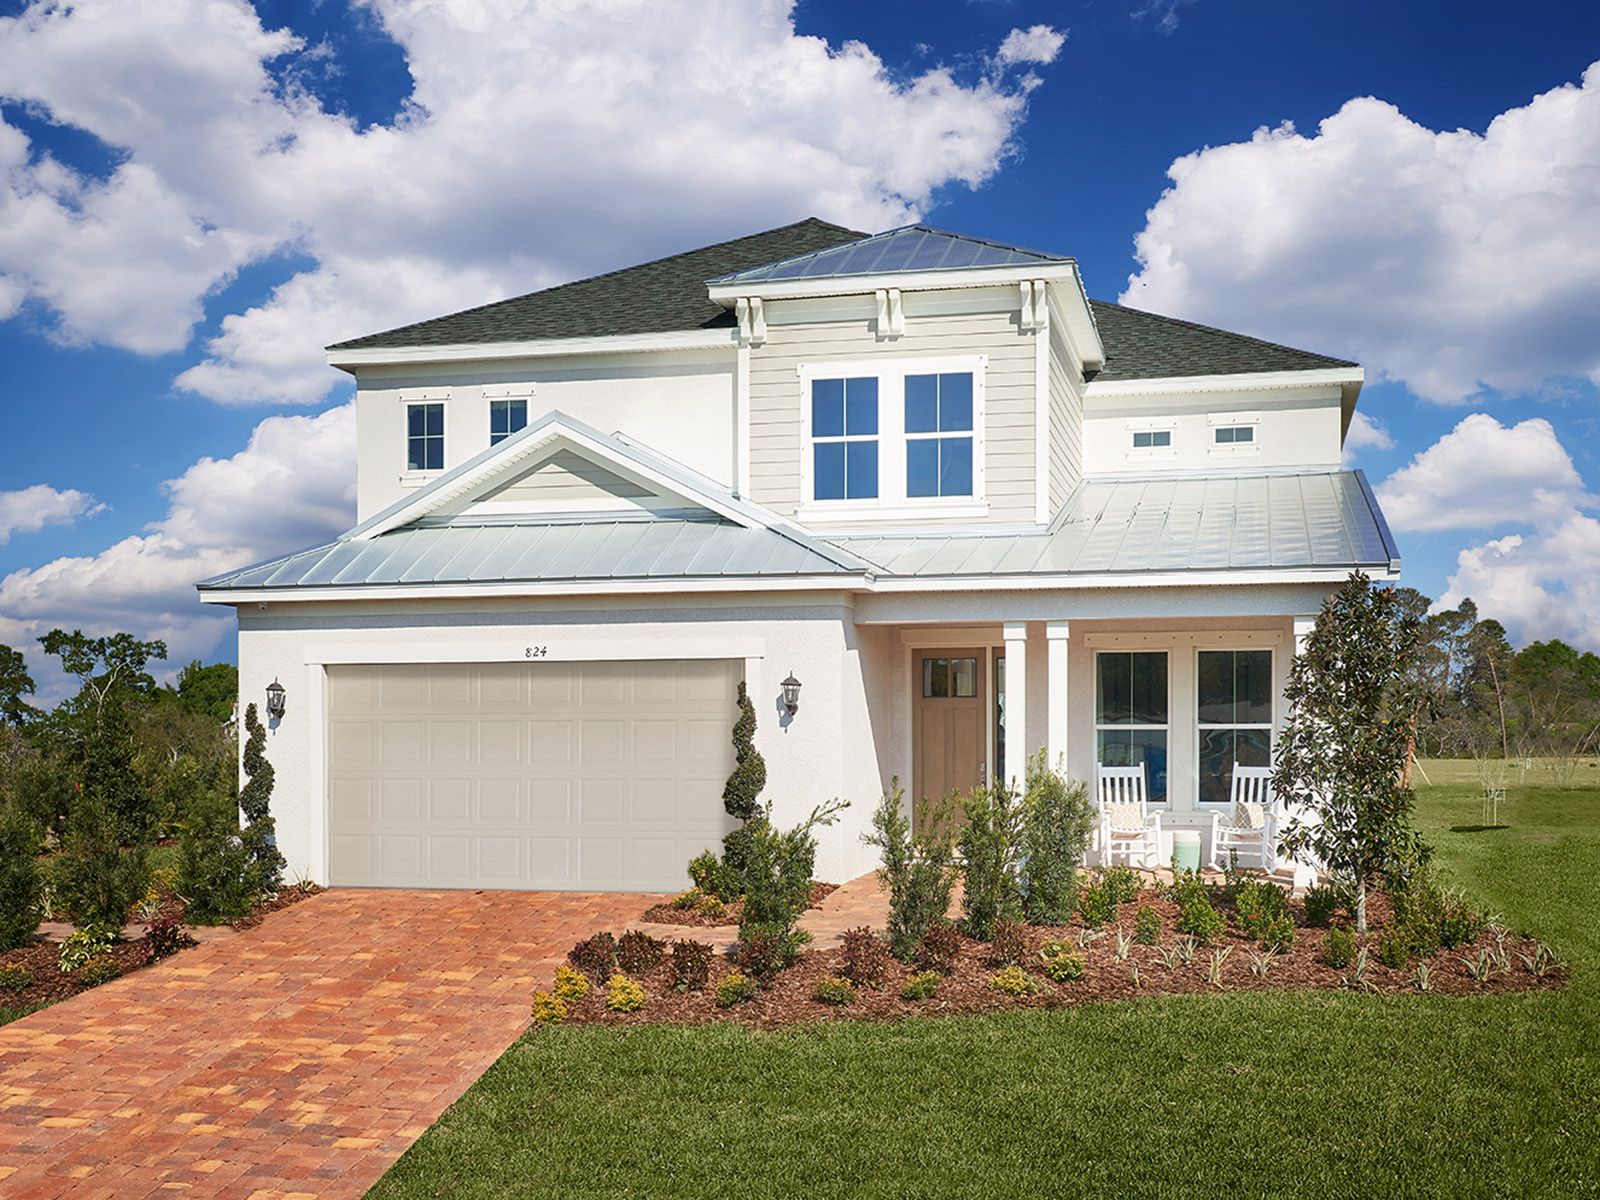 Single Family for Sale at Royal 731 W. Bayshore Drive Tarpon Springs, Florida 34689 United States